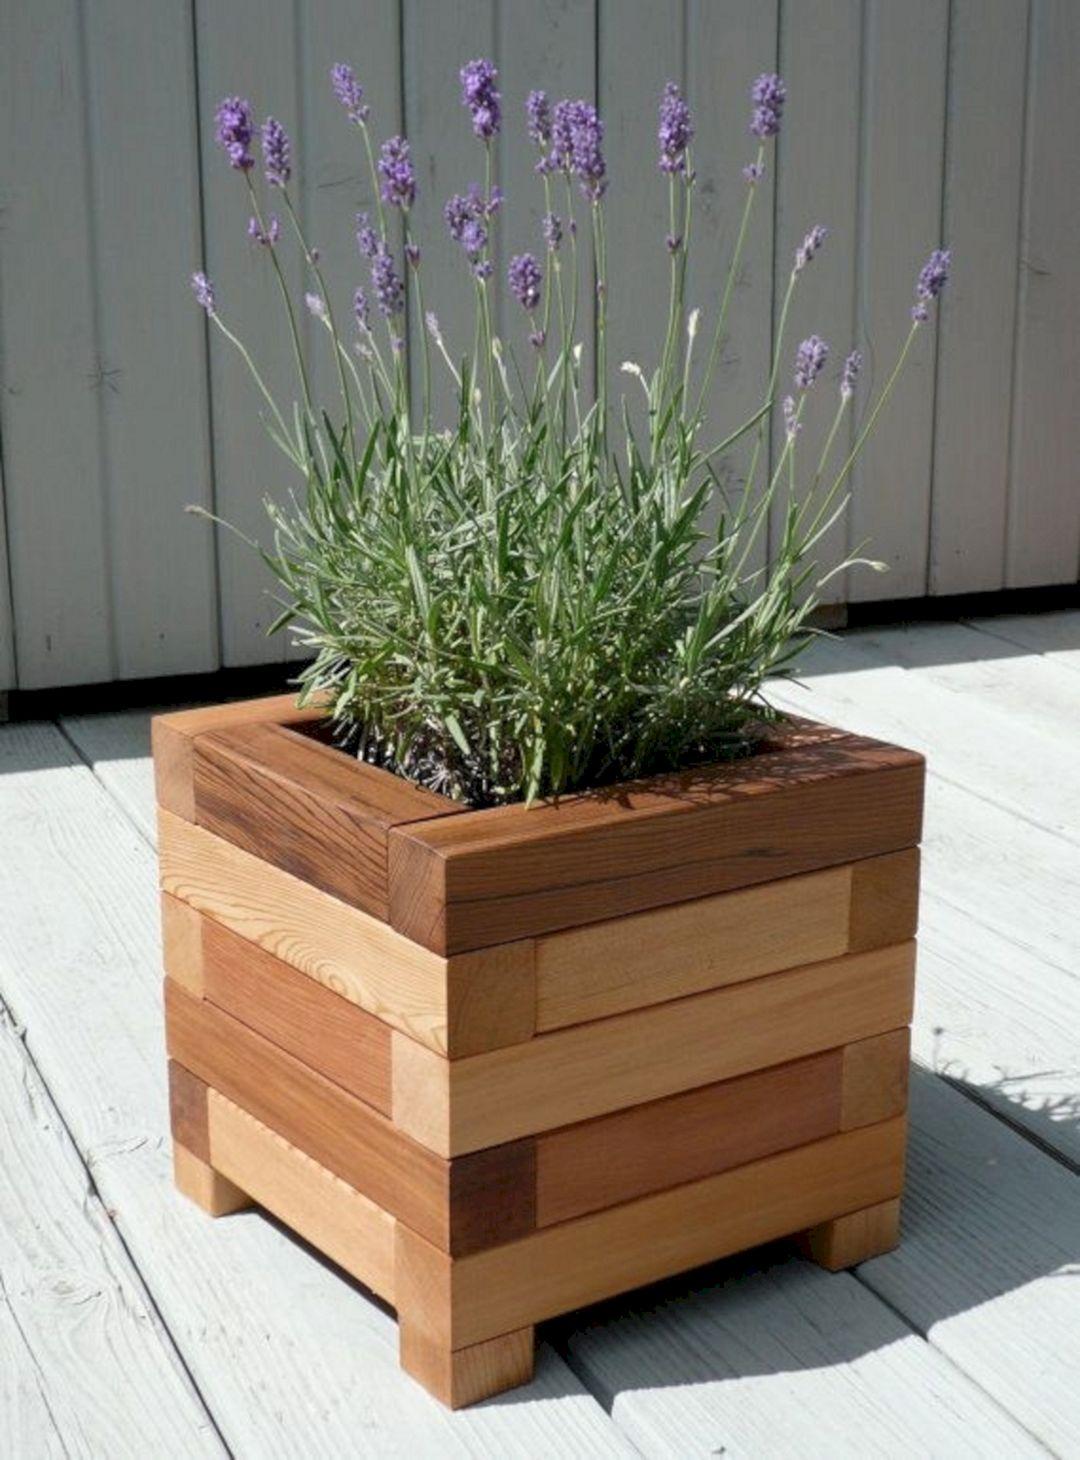 Diy wooden planter box ideas 1 diy wooden planter box for Wooden plant pot ideas